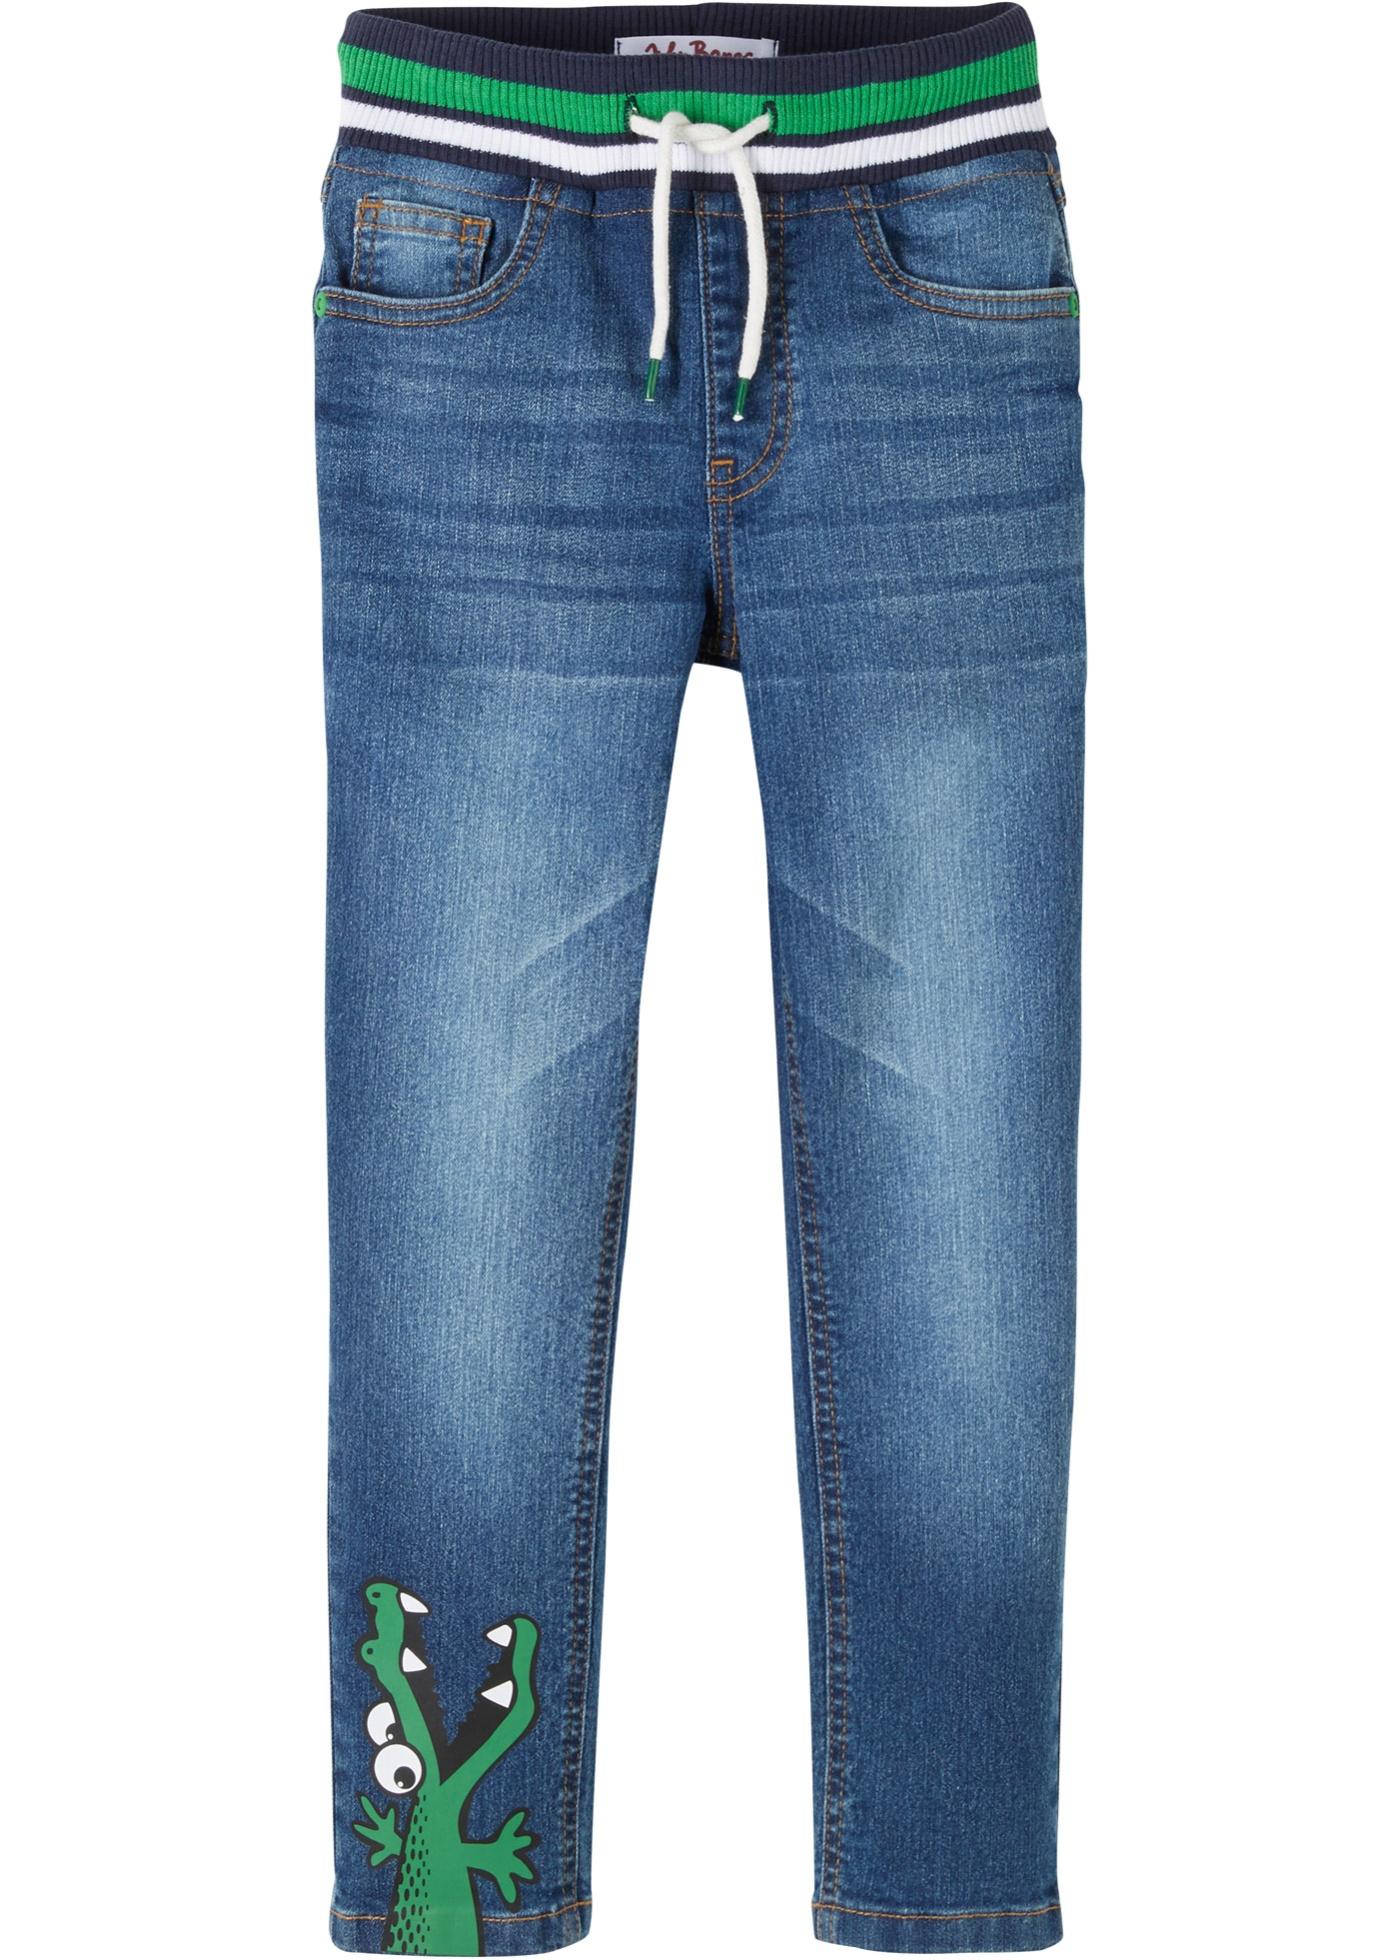 Jungen Jeans mit Dinomotiv, Regular Fit